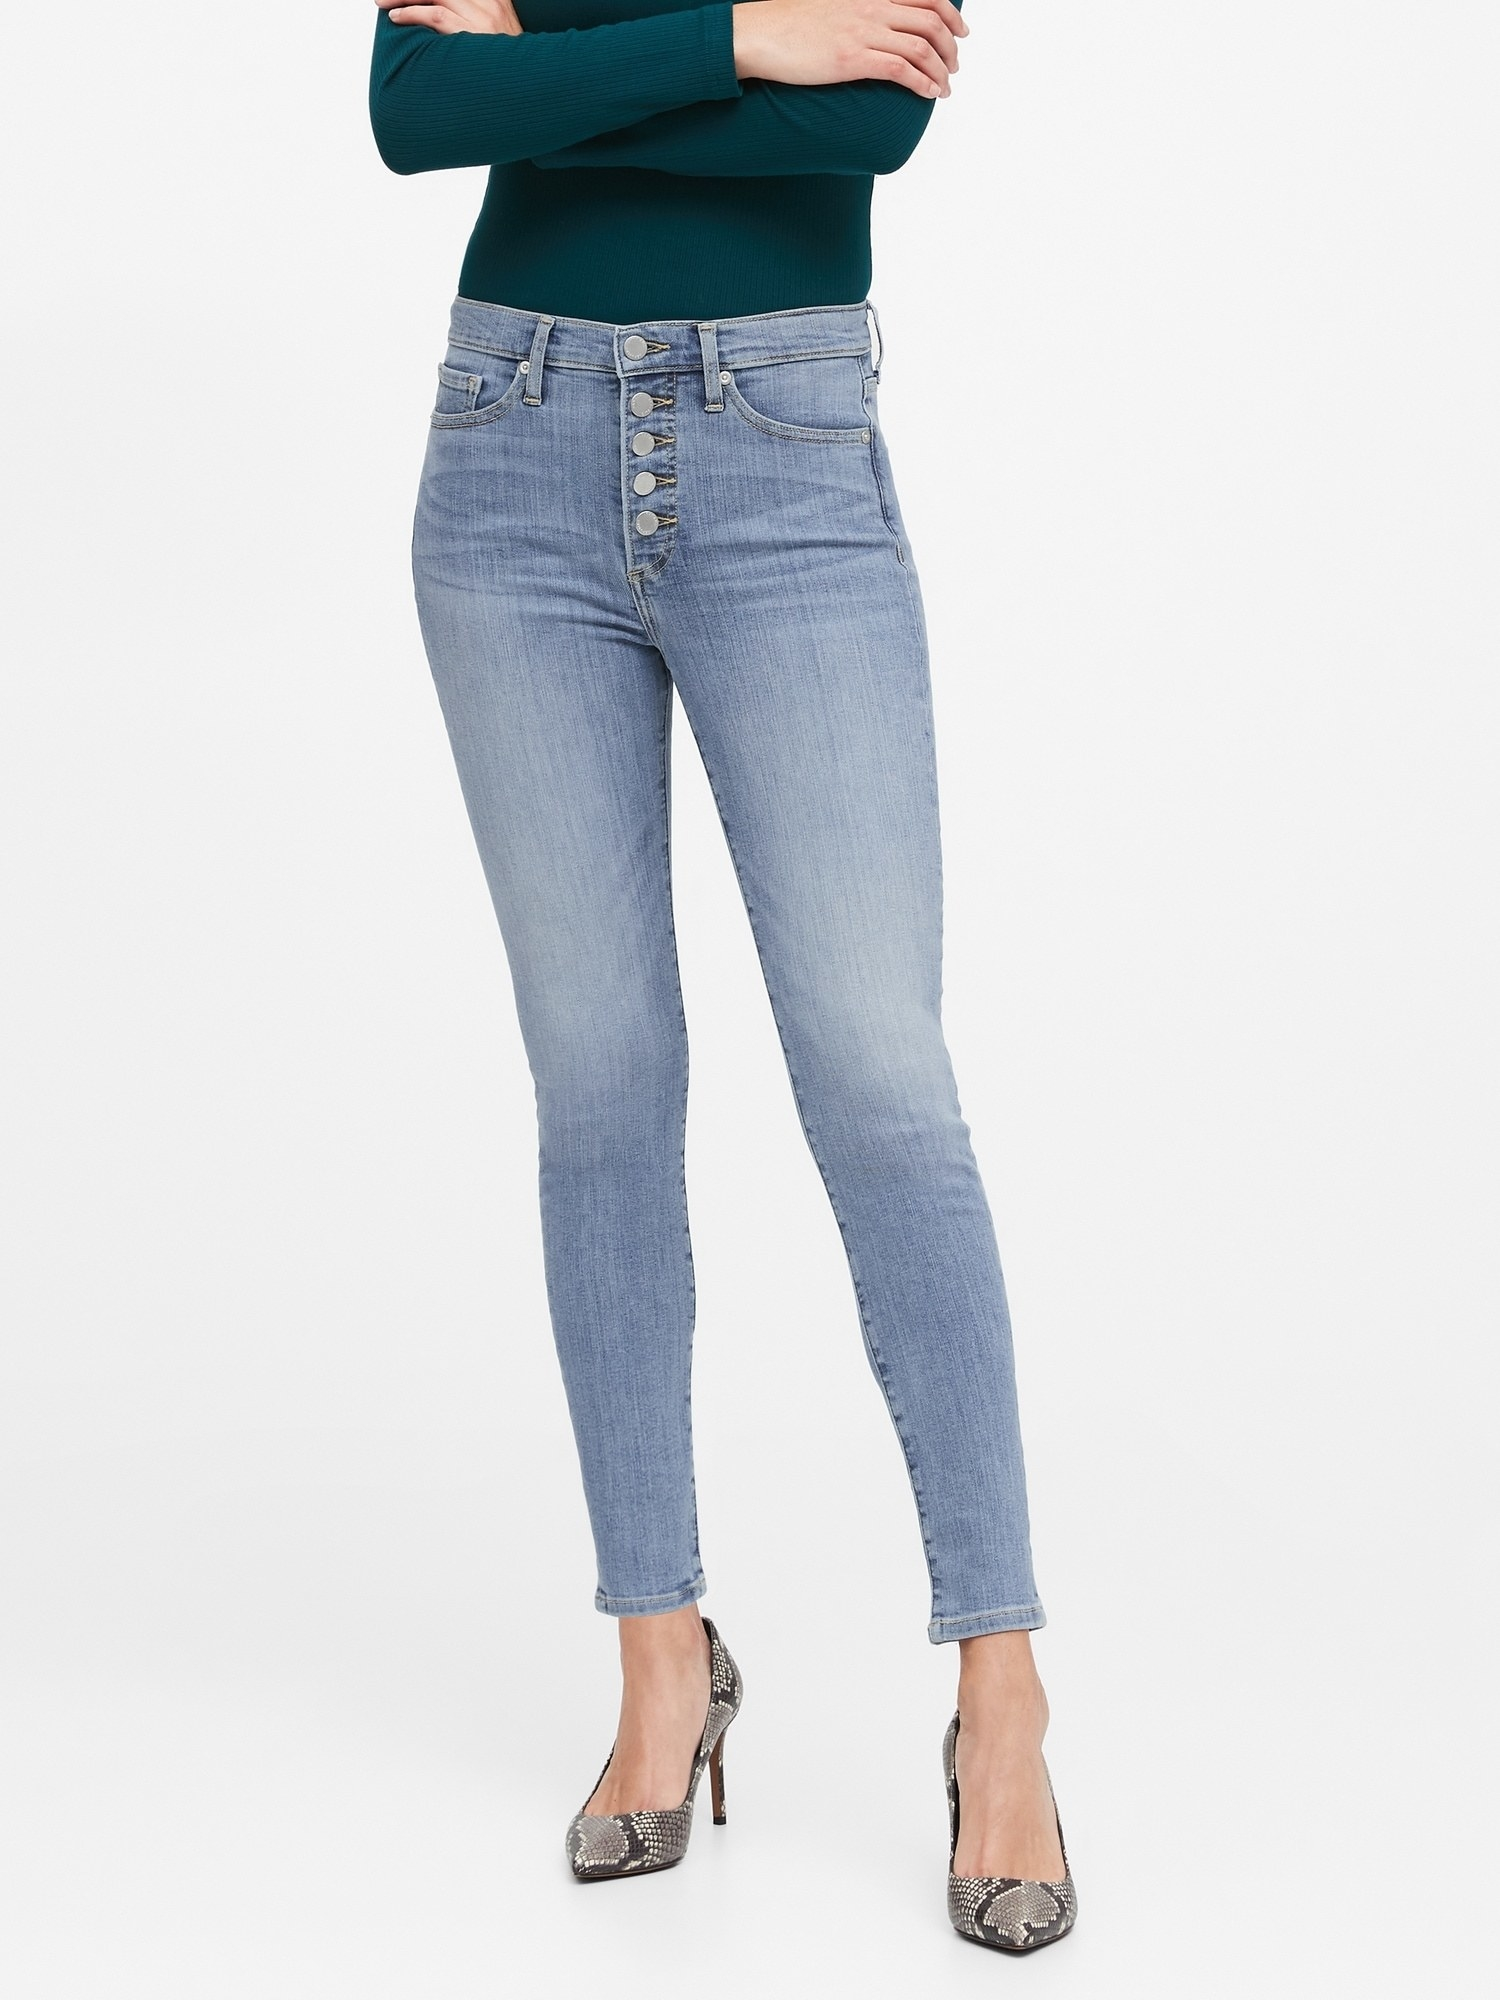 Model wearing the jeans in a light denim wash